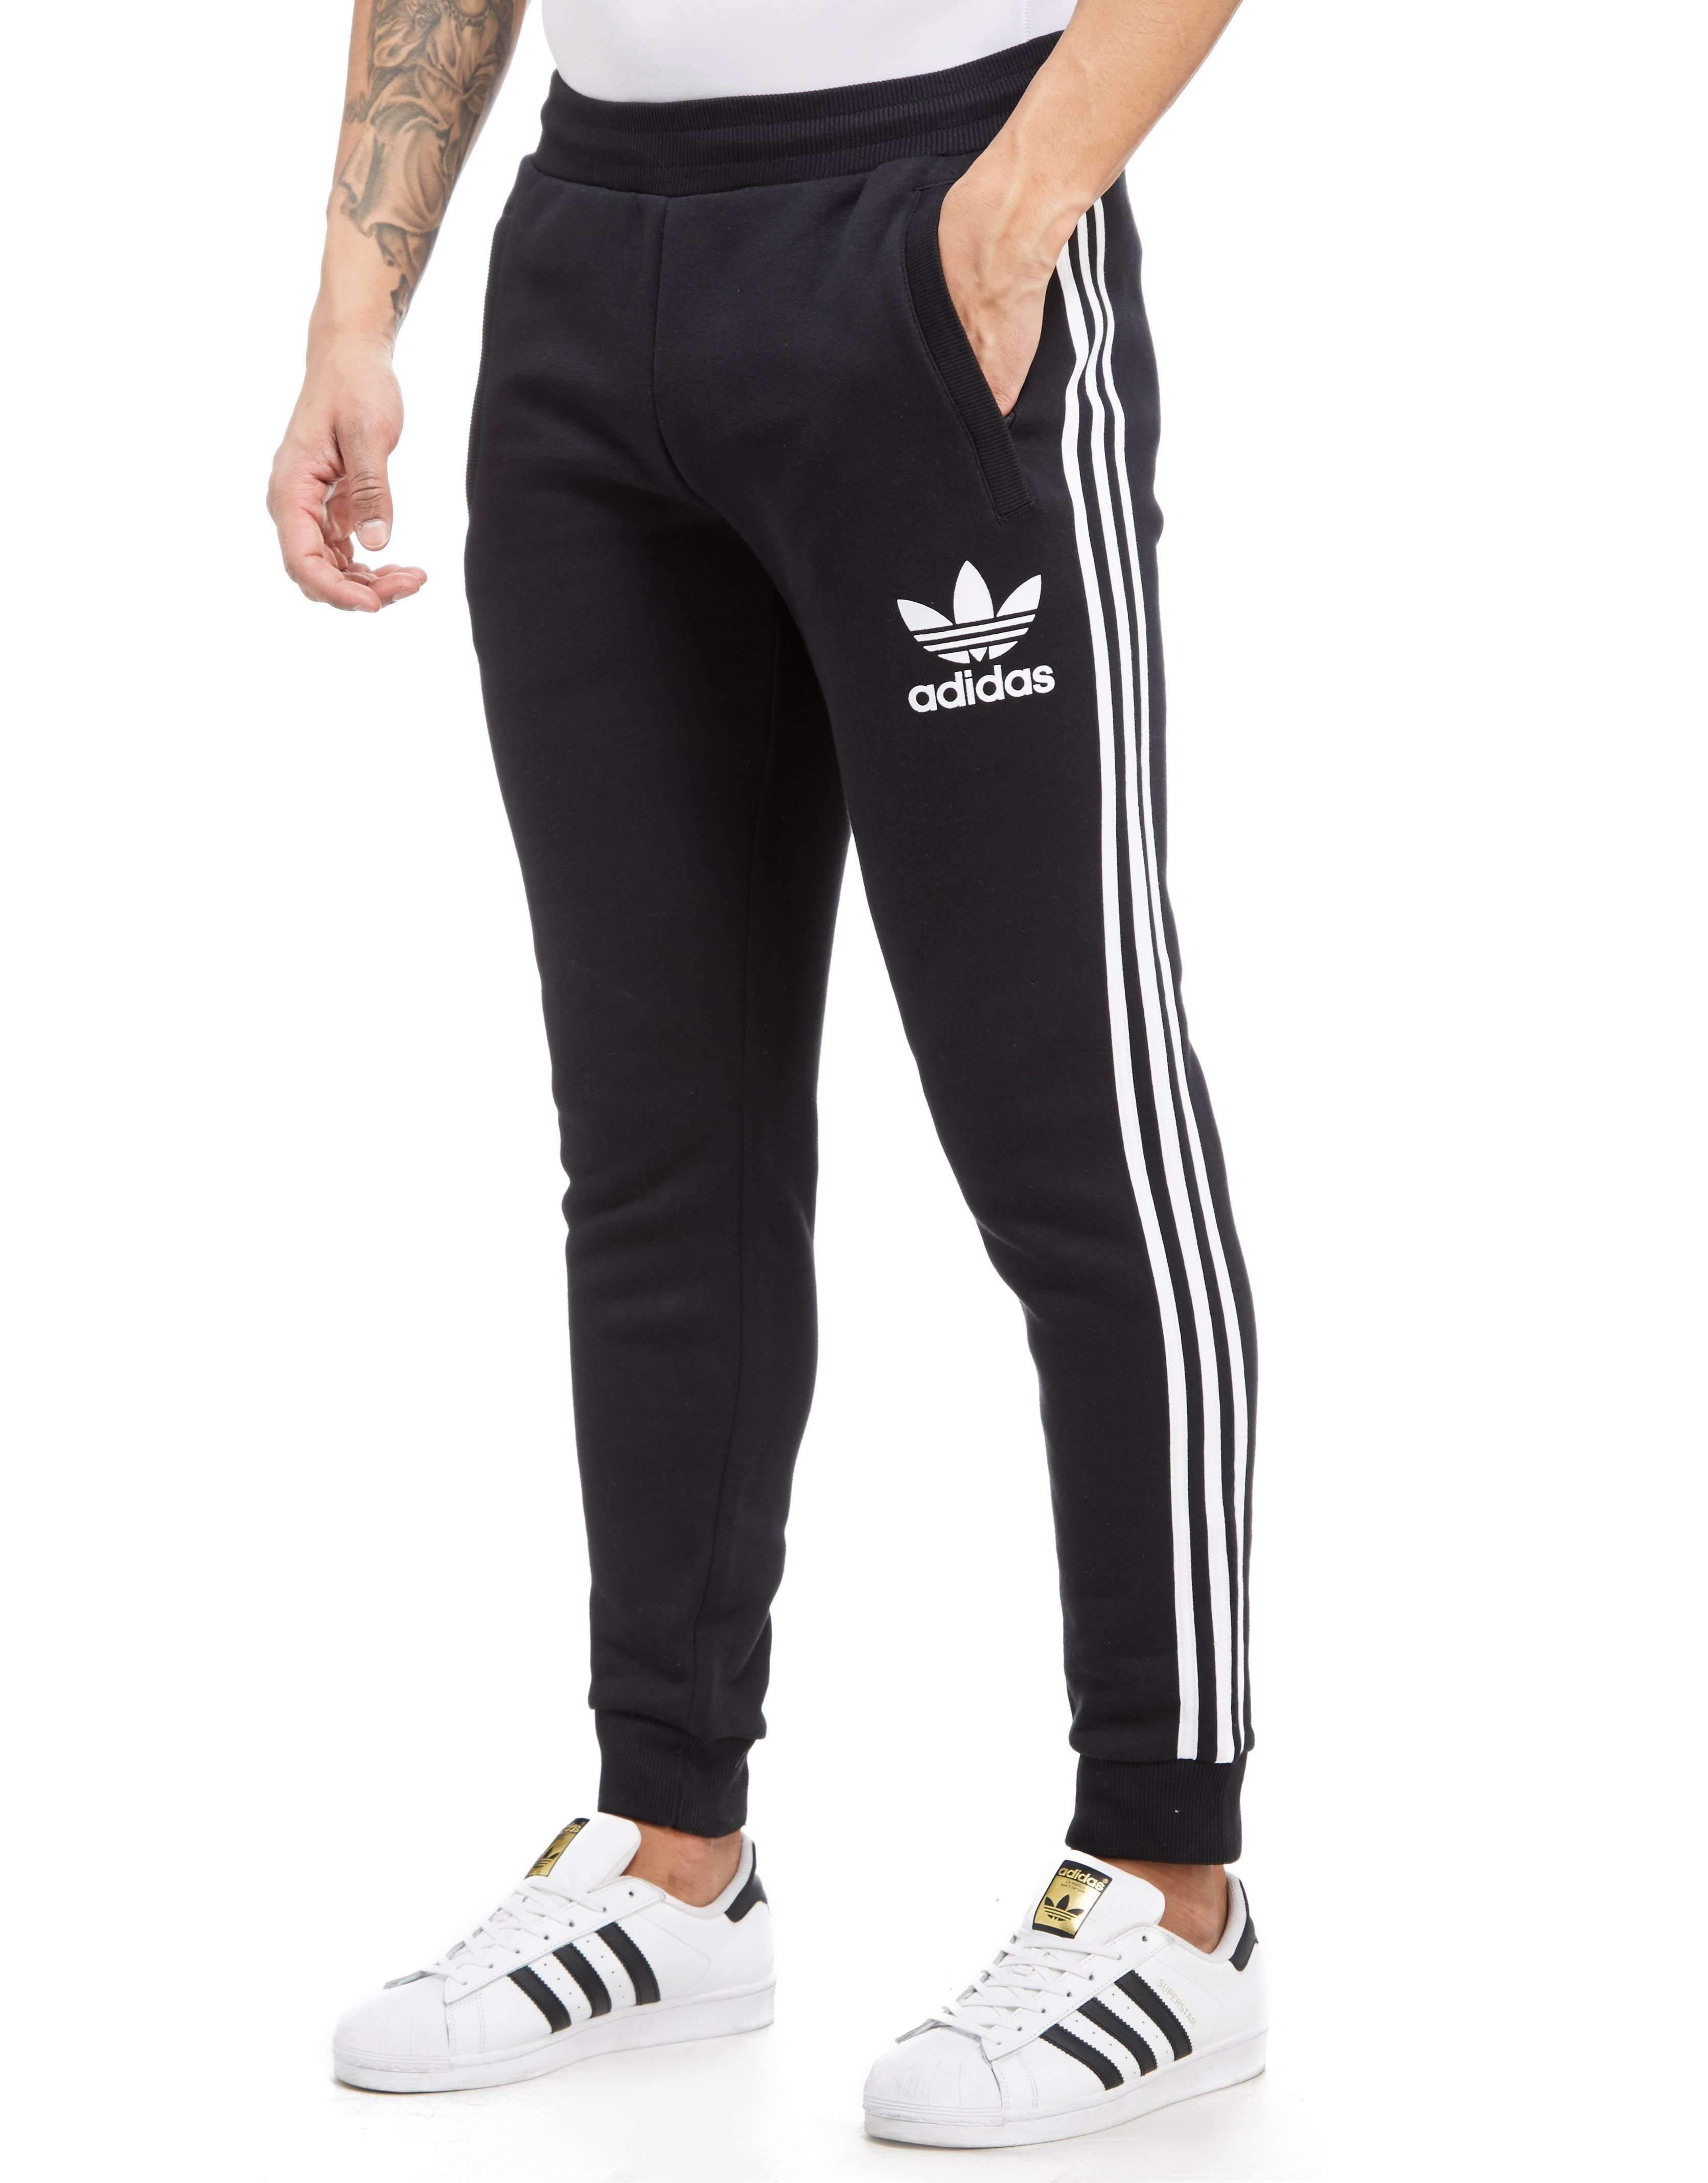 Original Adidas Pantalon Pas Cher Acheter wE4Pxdq4